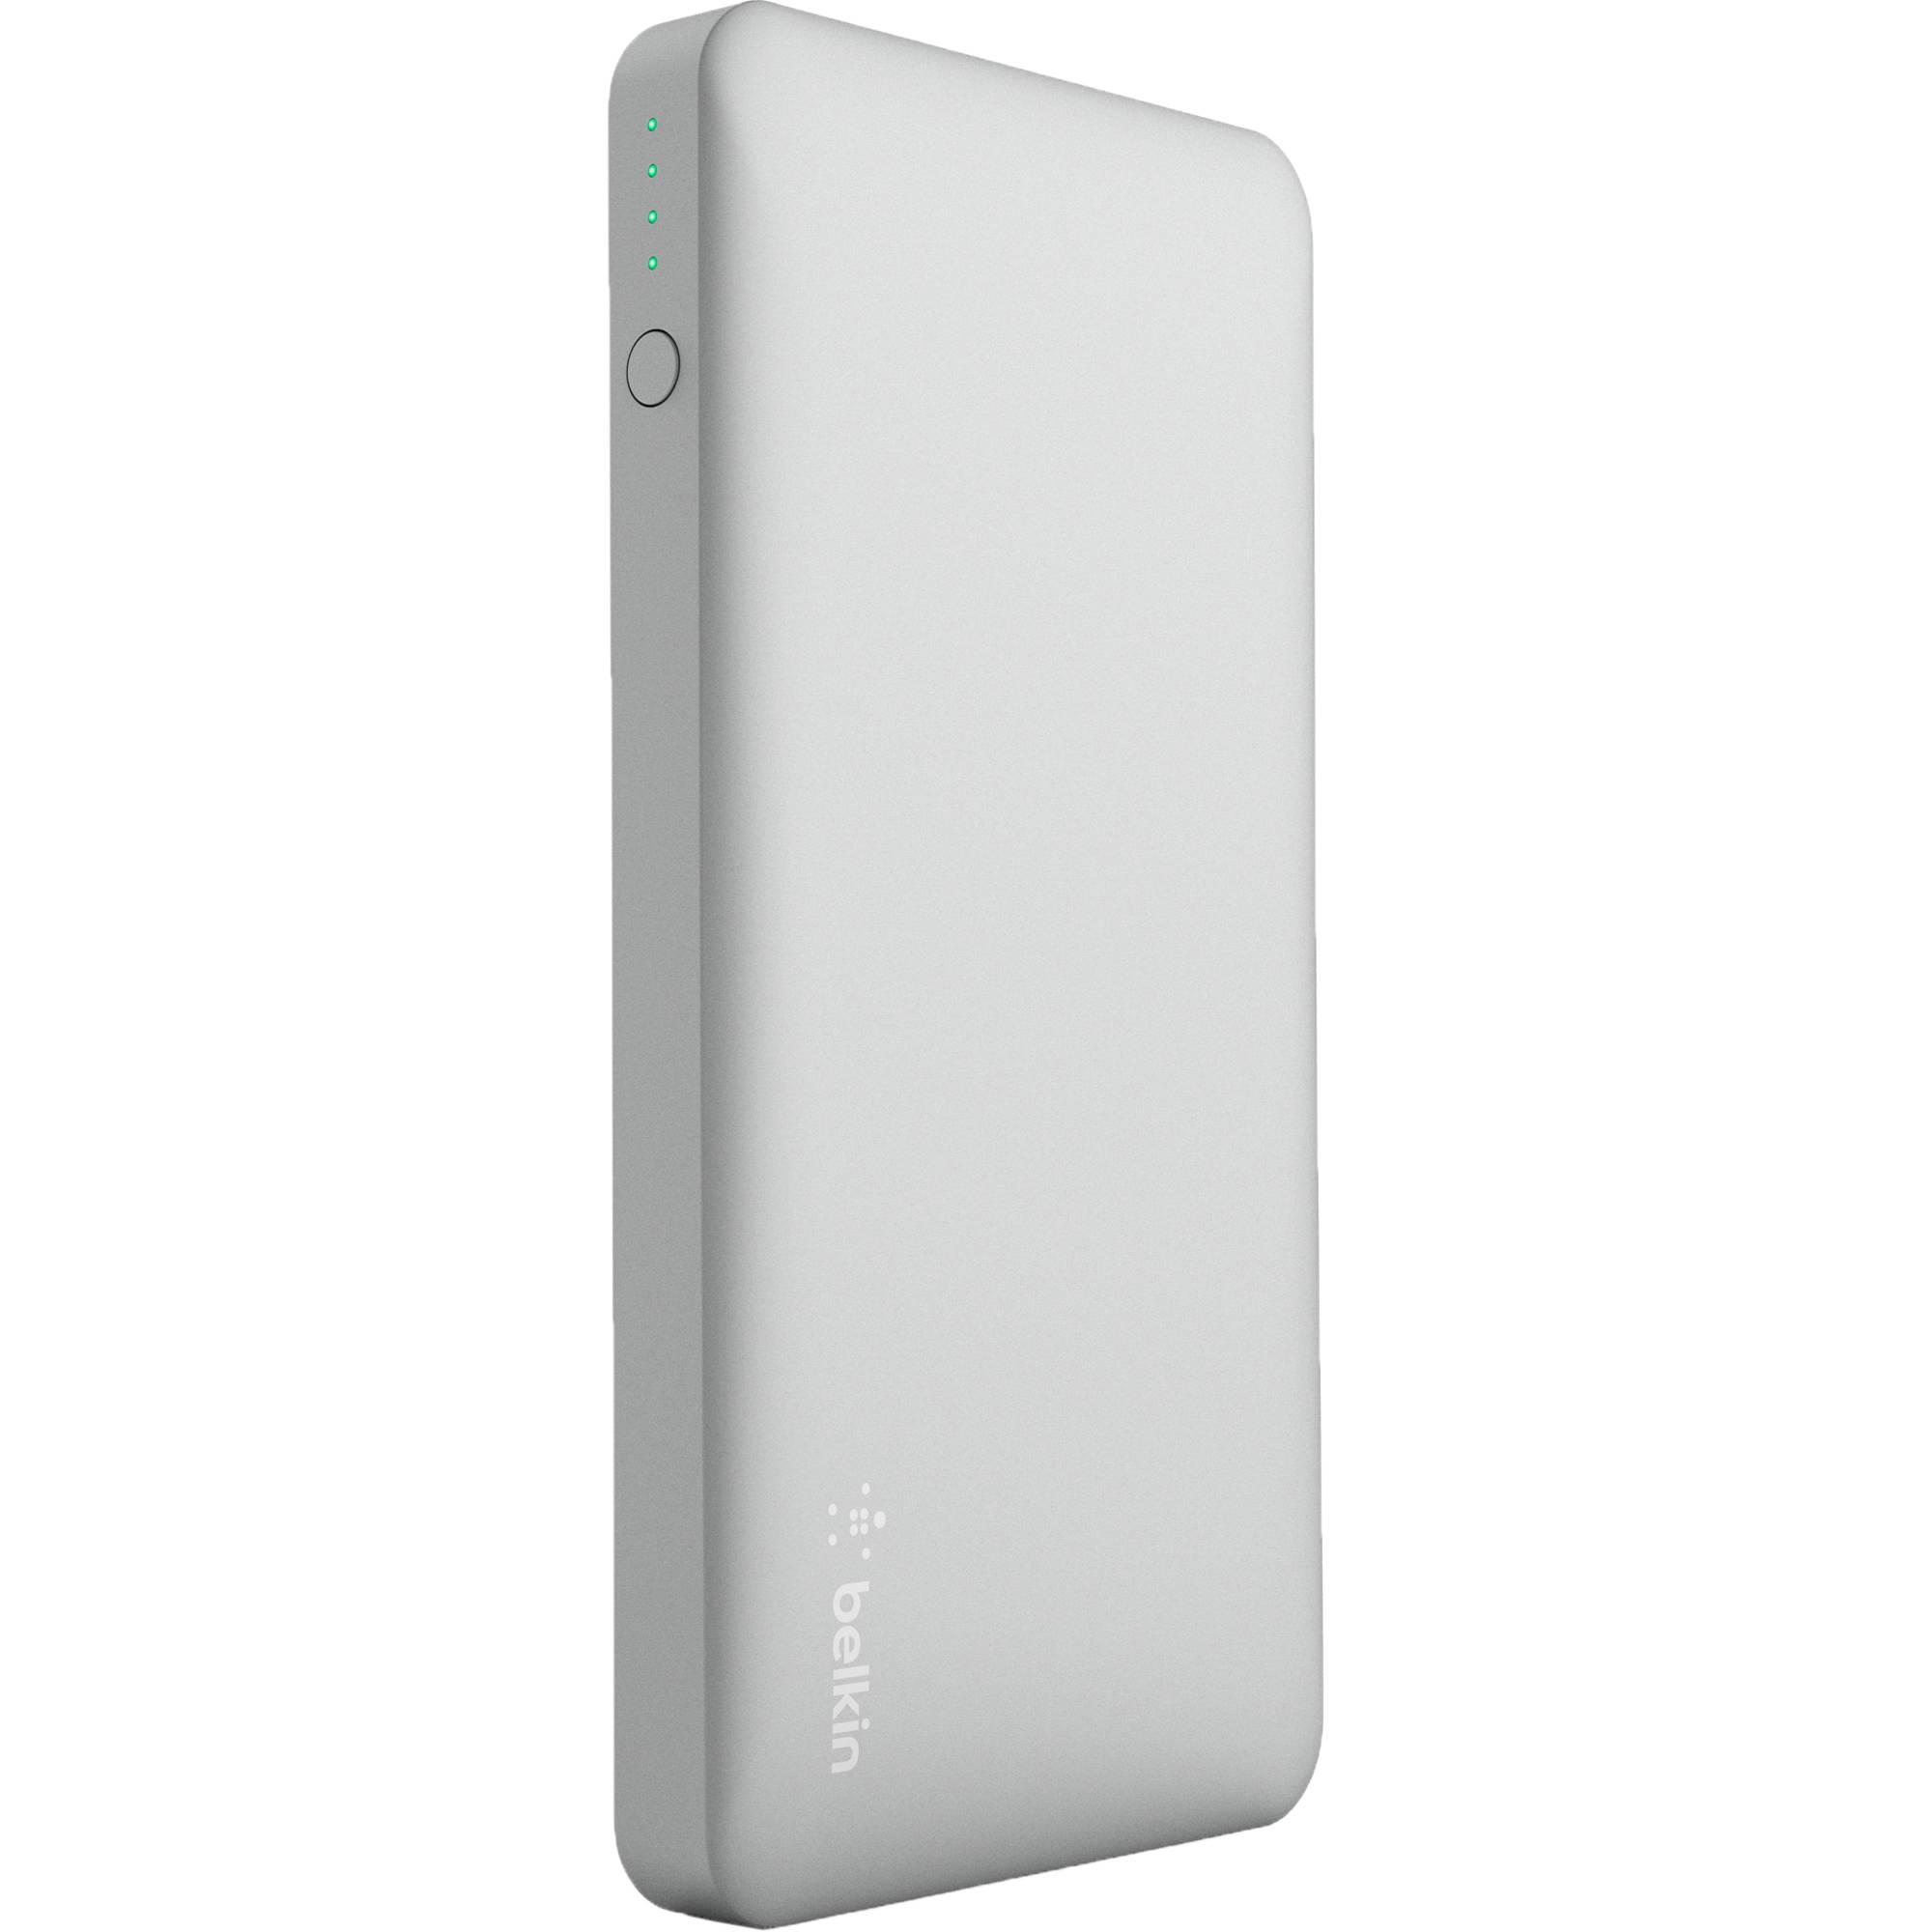 Belkin Pocket Power 10k Bank Silver F7u020btslv Bh Wk Design Powerbank Mirror 10000 Mah